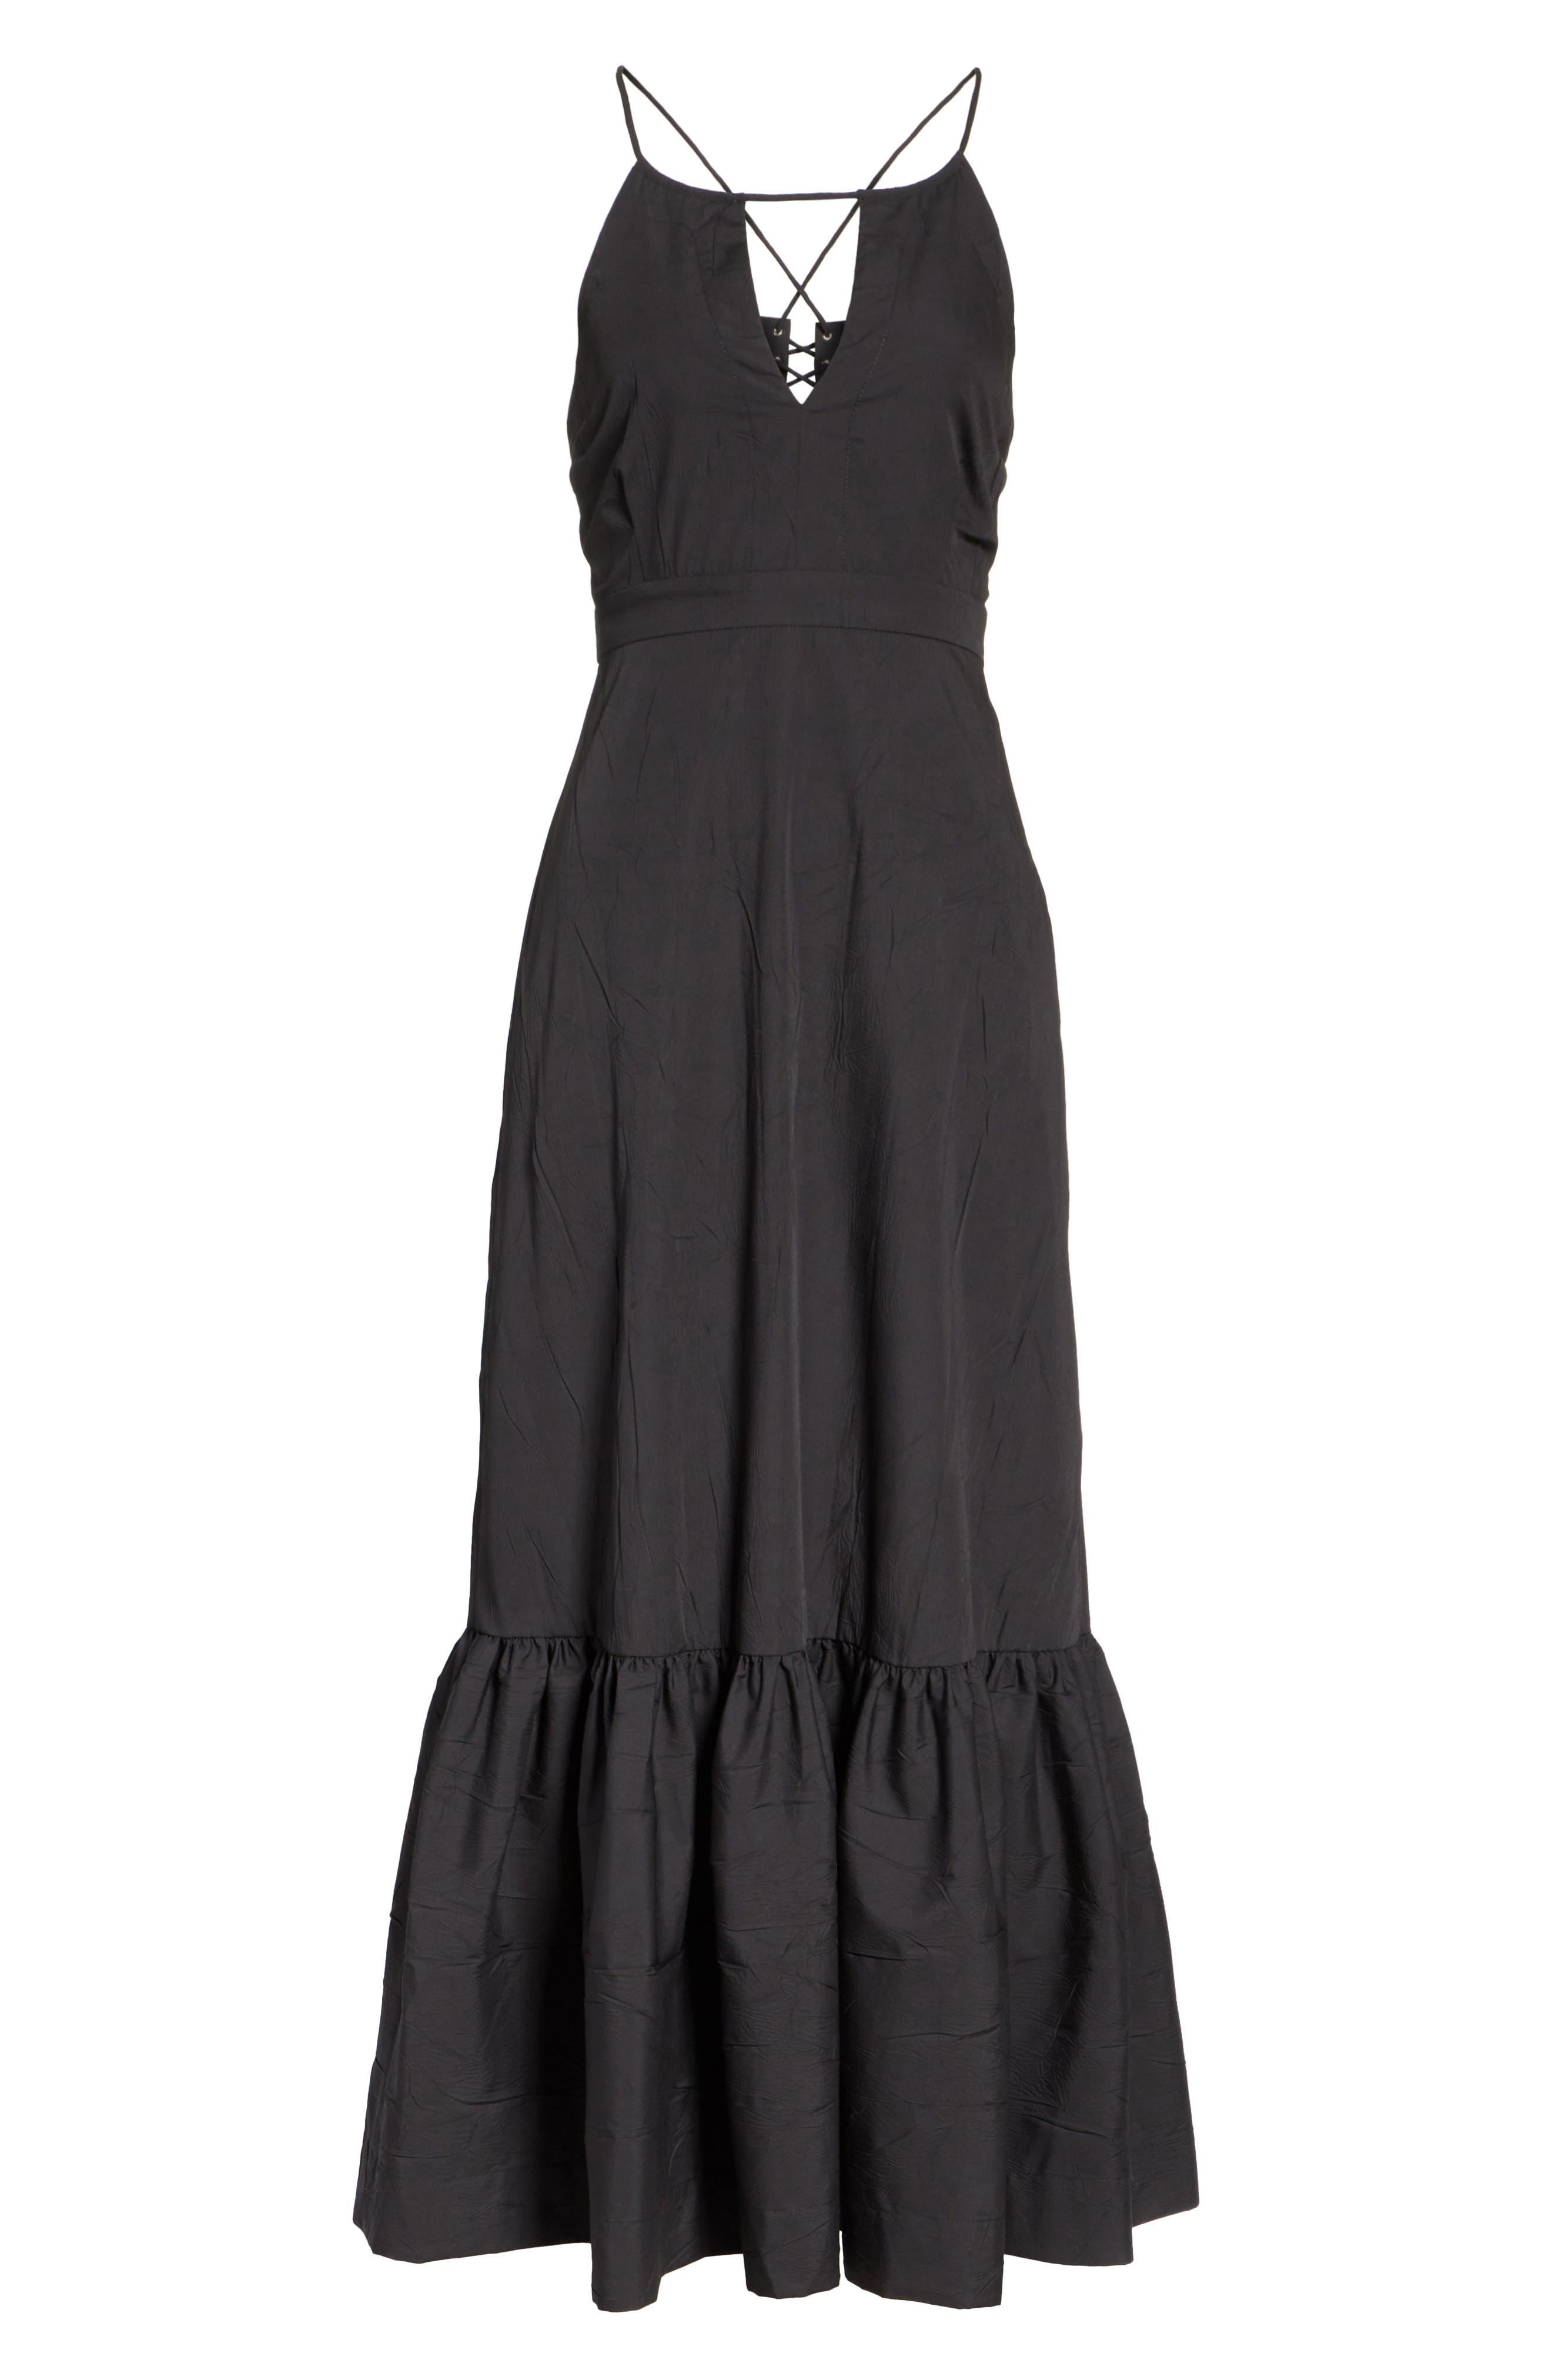 Tiered Halter Keyhole Dress,                             Alternate thumbnail 6, color,                             Black